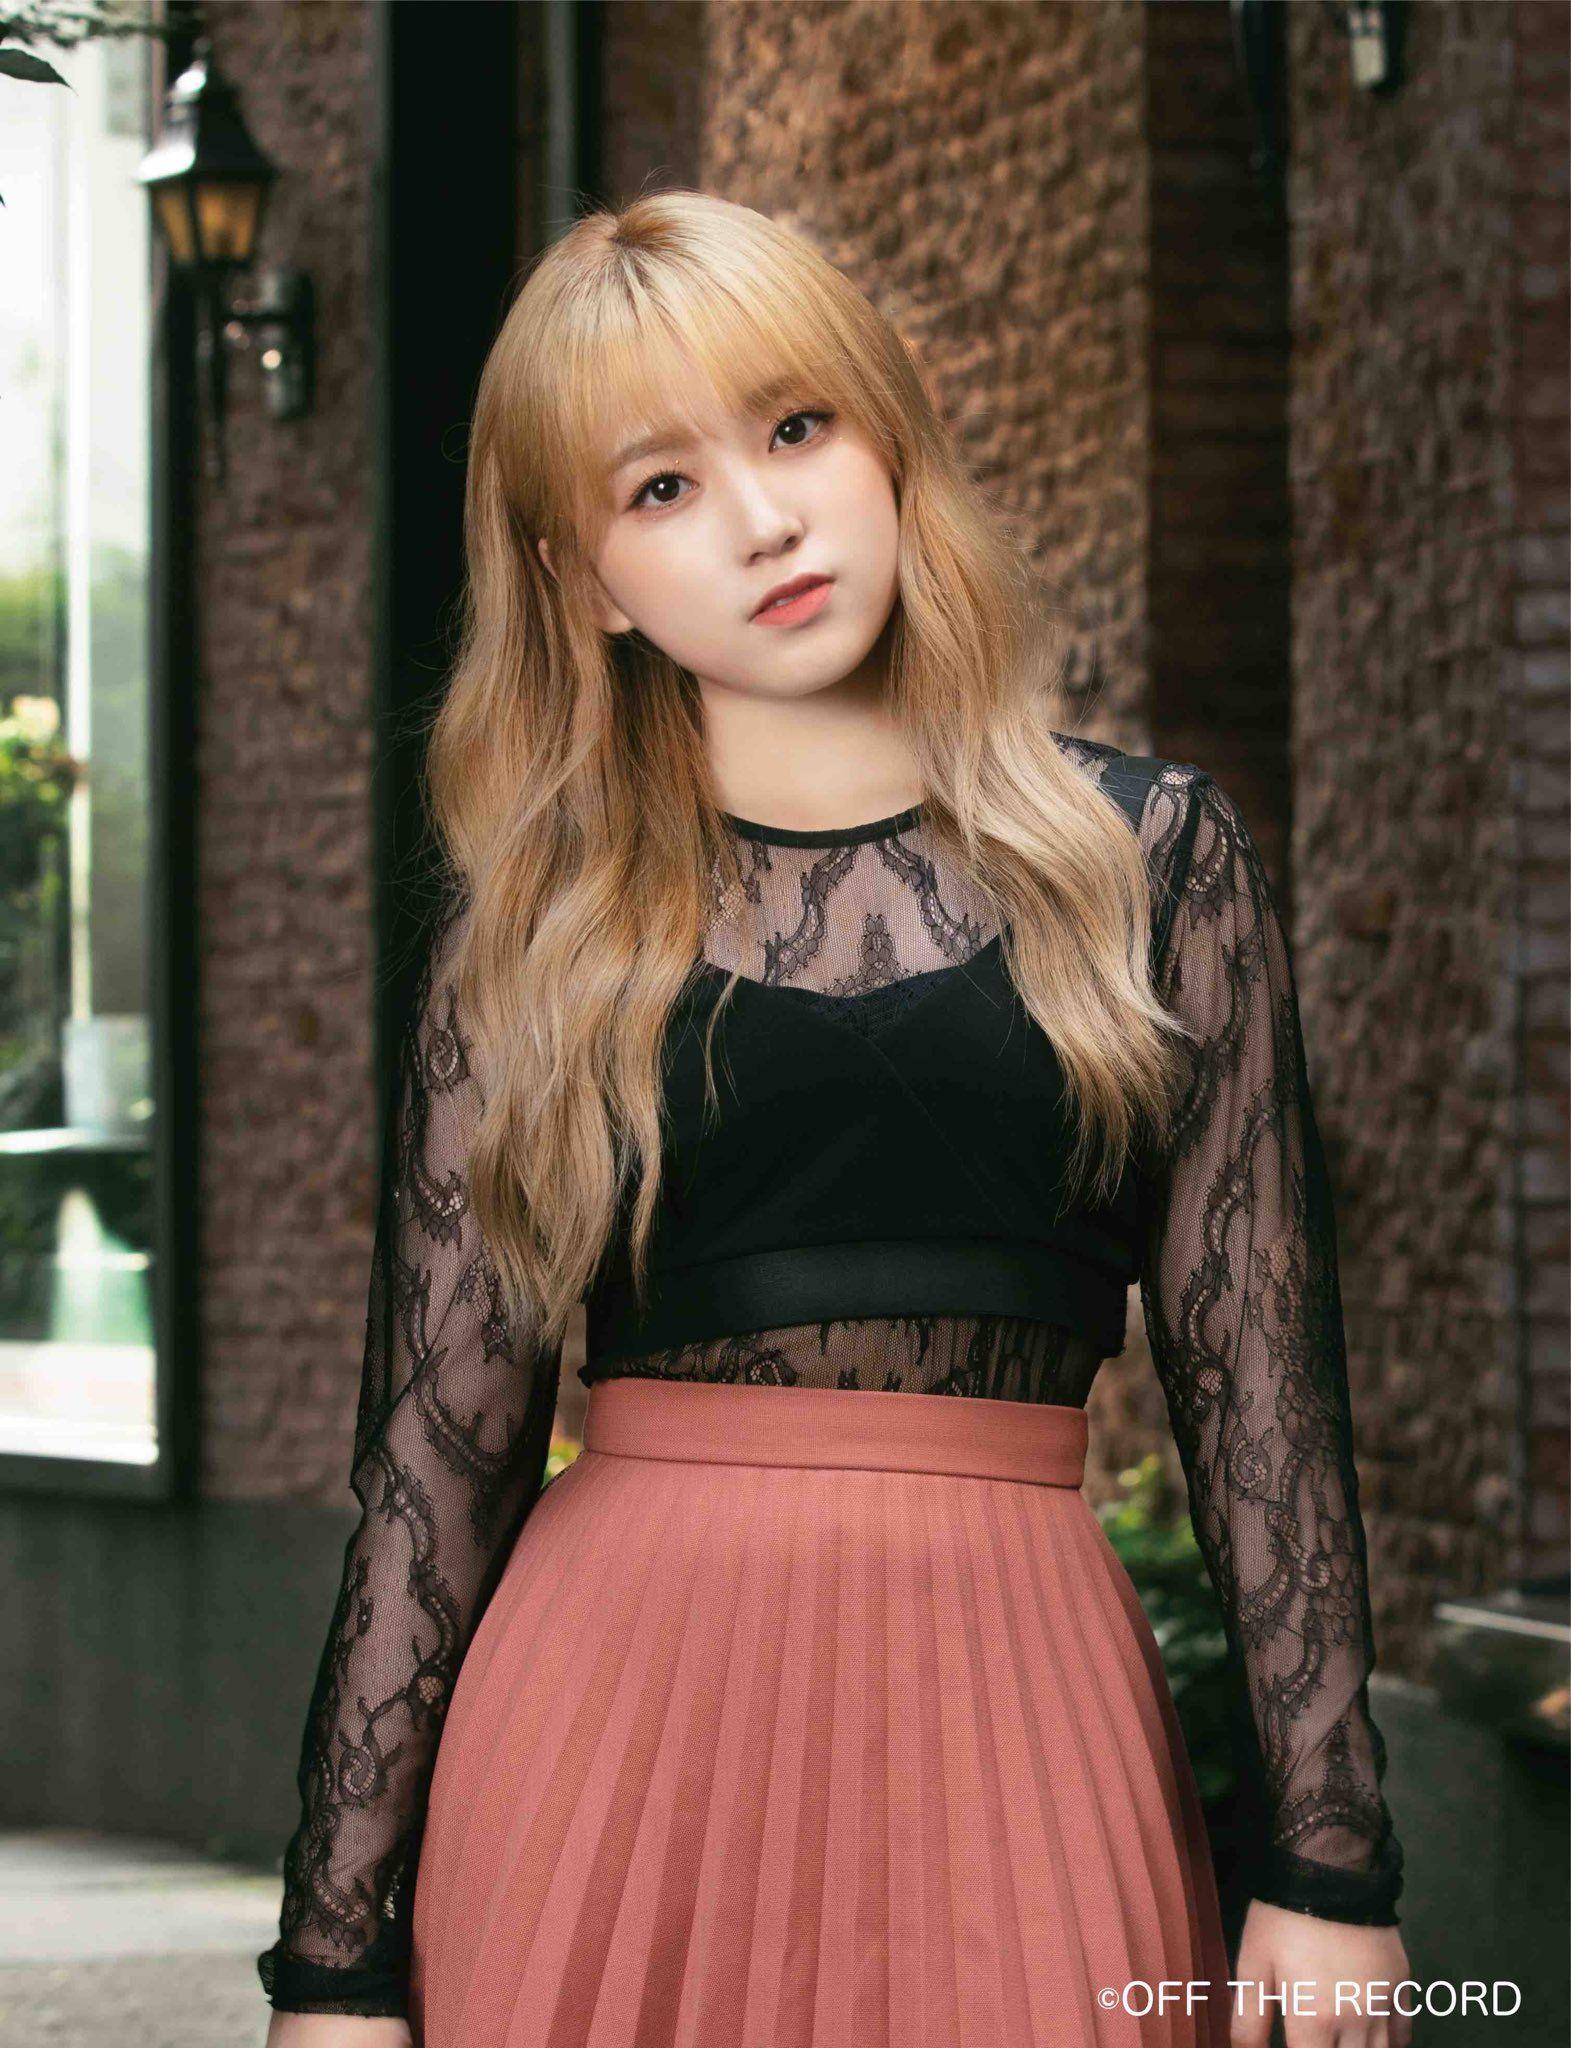 IZ*ONE-Chaeyeon official update | Chaeyeon, Kpop girls, Japanese girl group